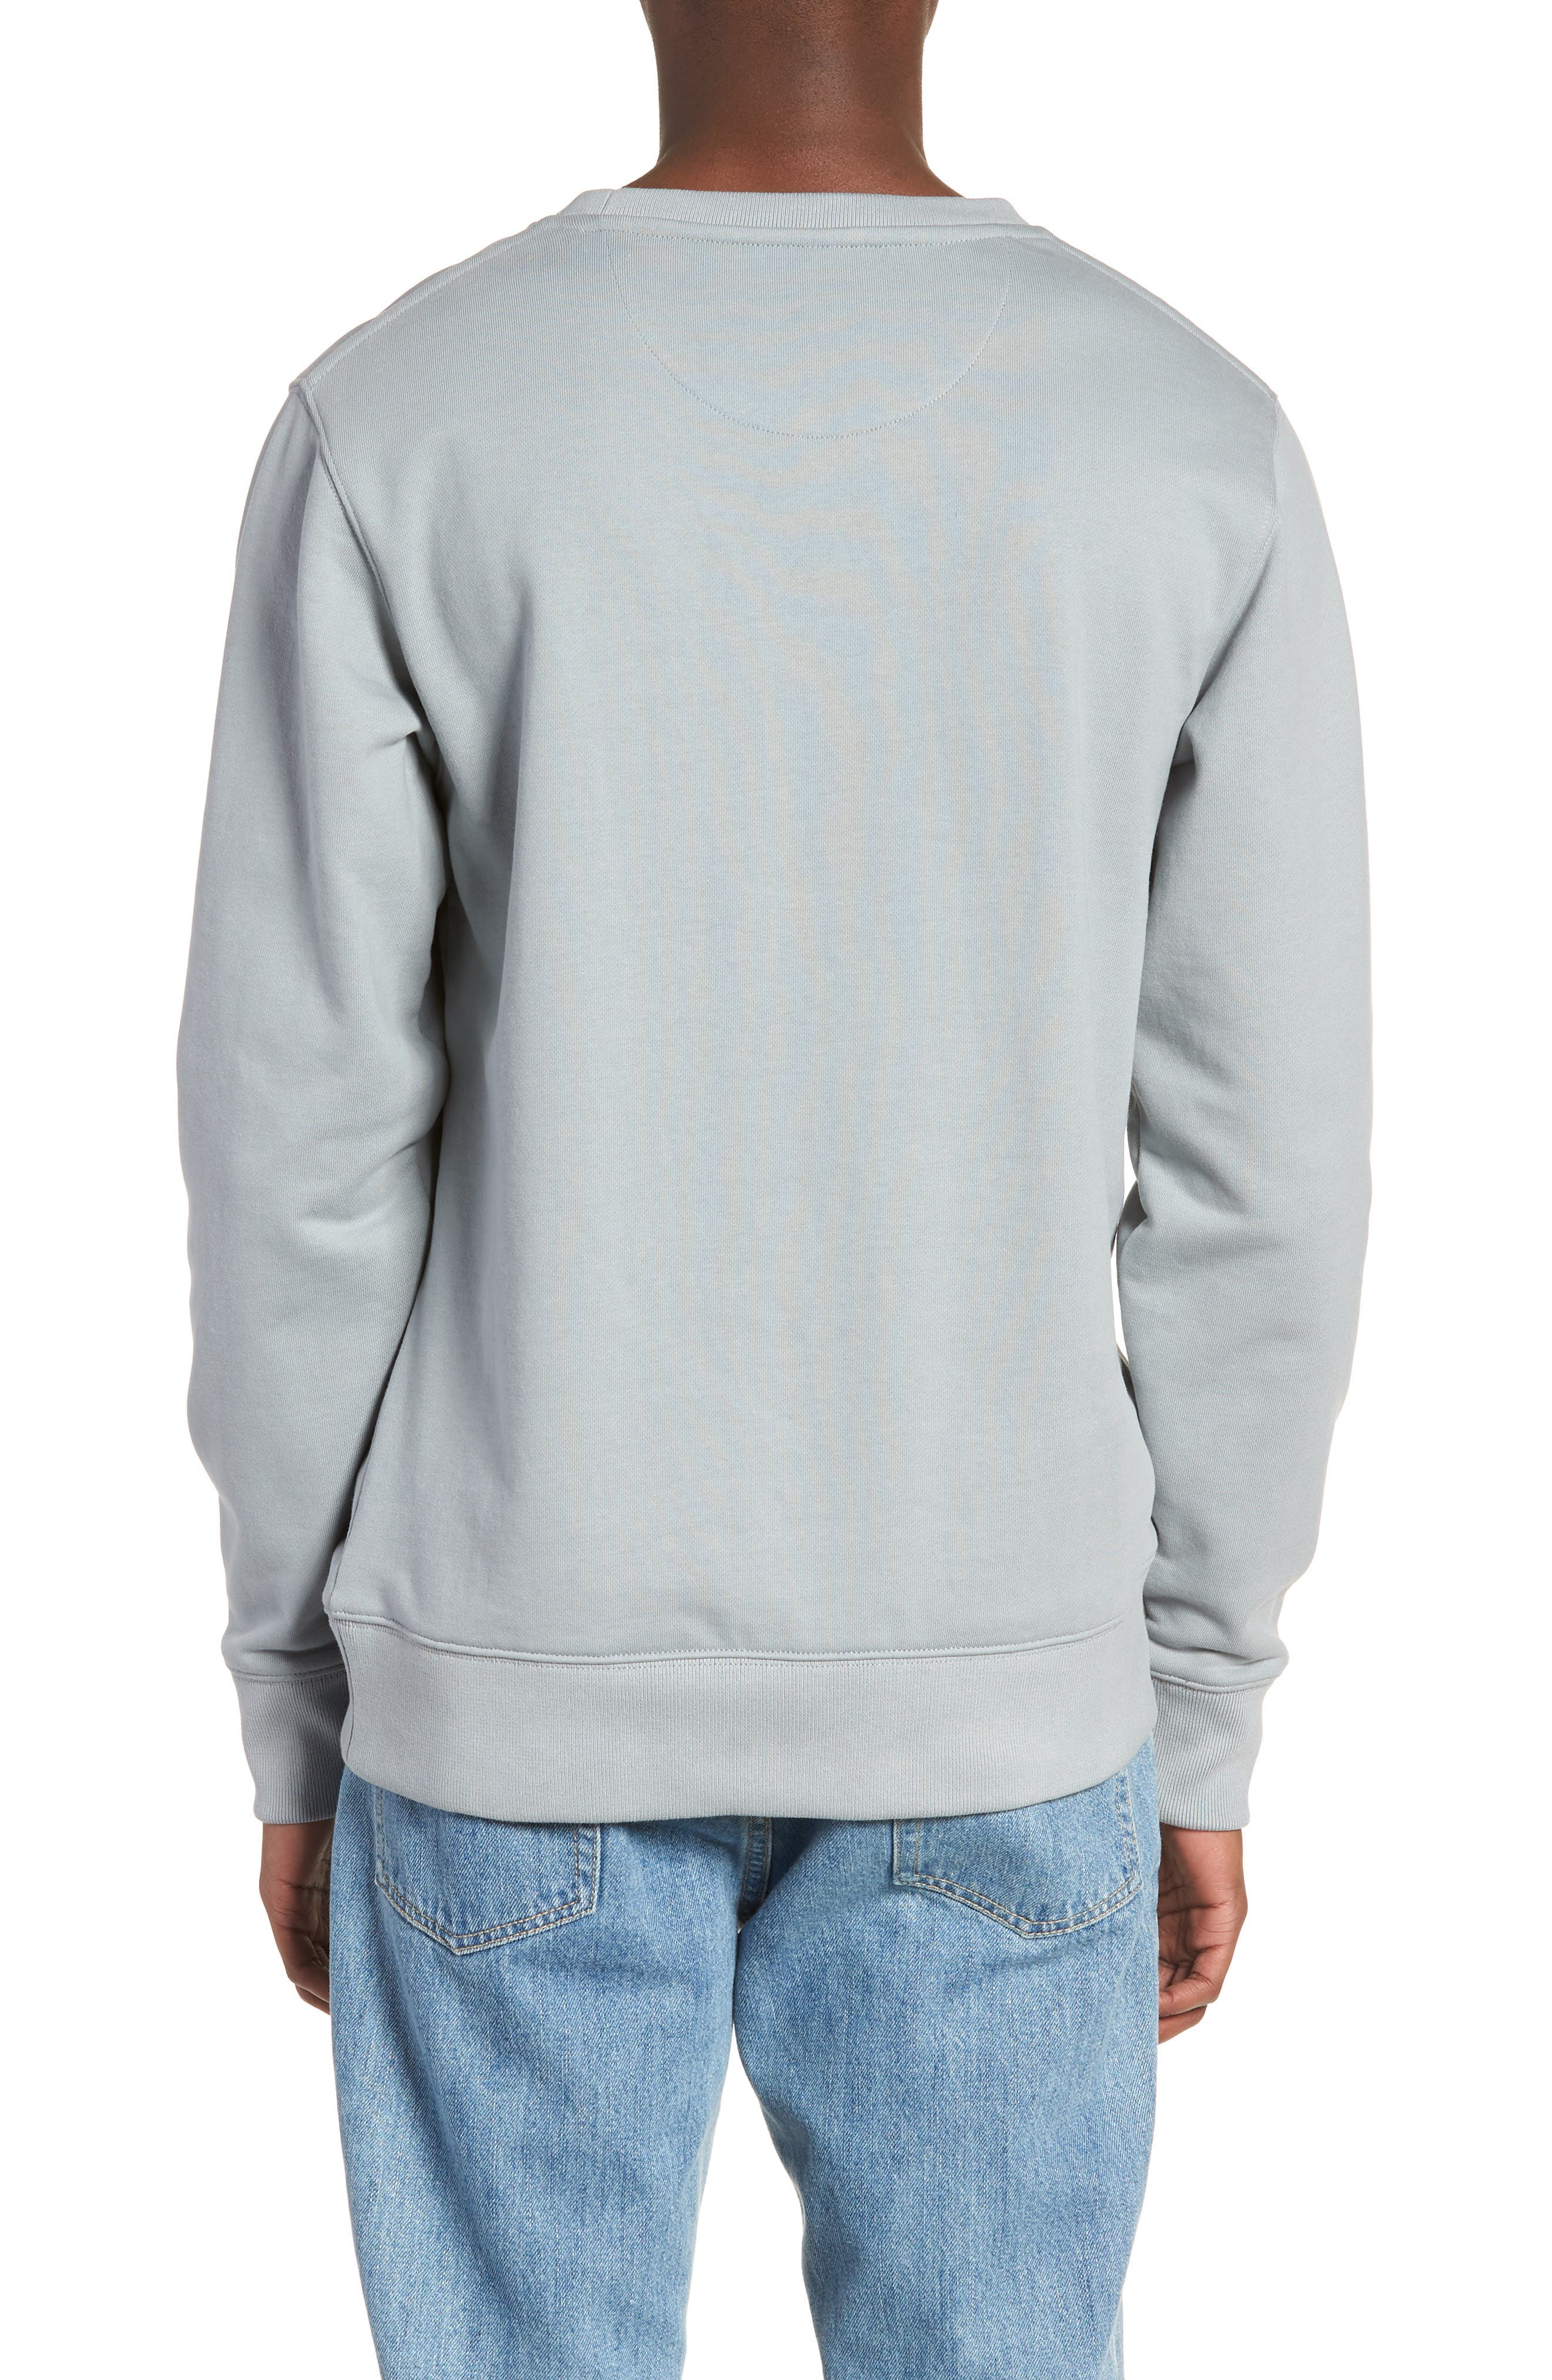 Bowery Gothic Sweatshirt,                             Alternate thumbnail 2, color,                             455